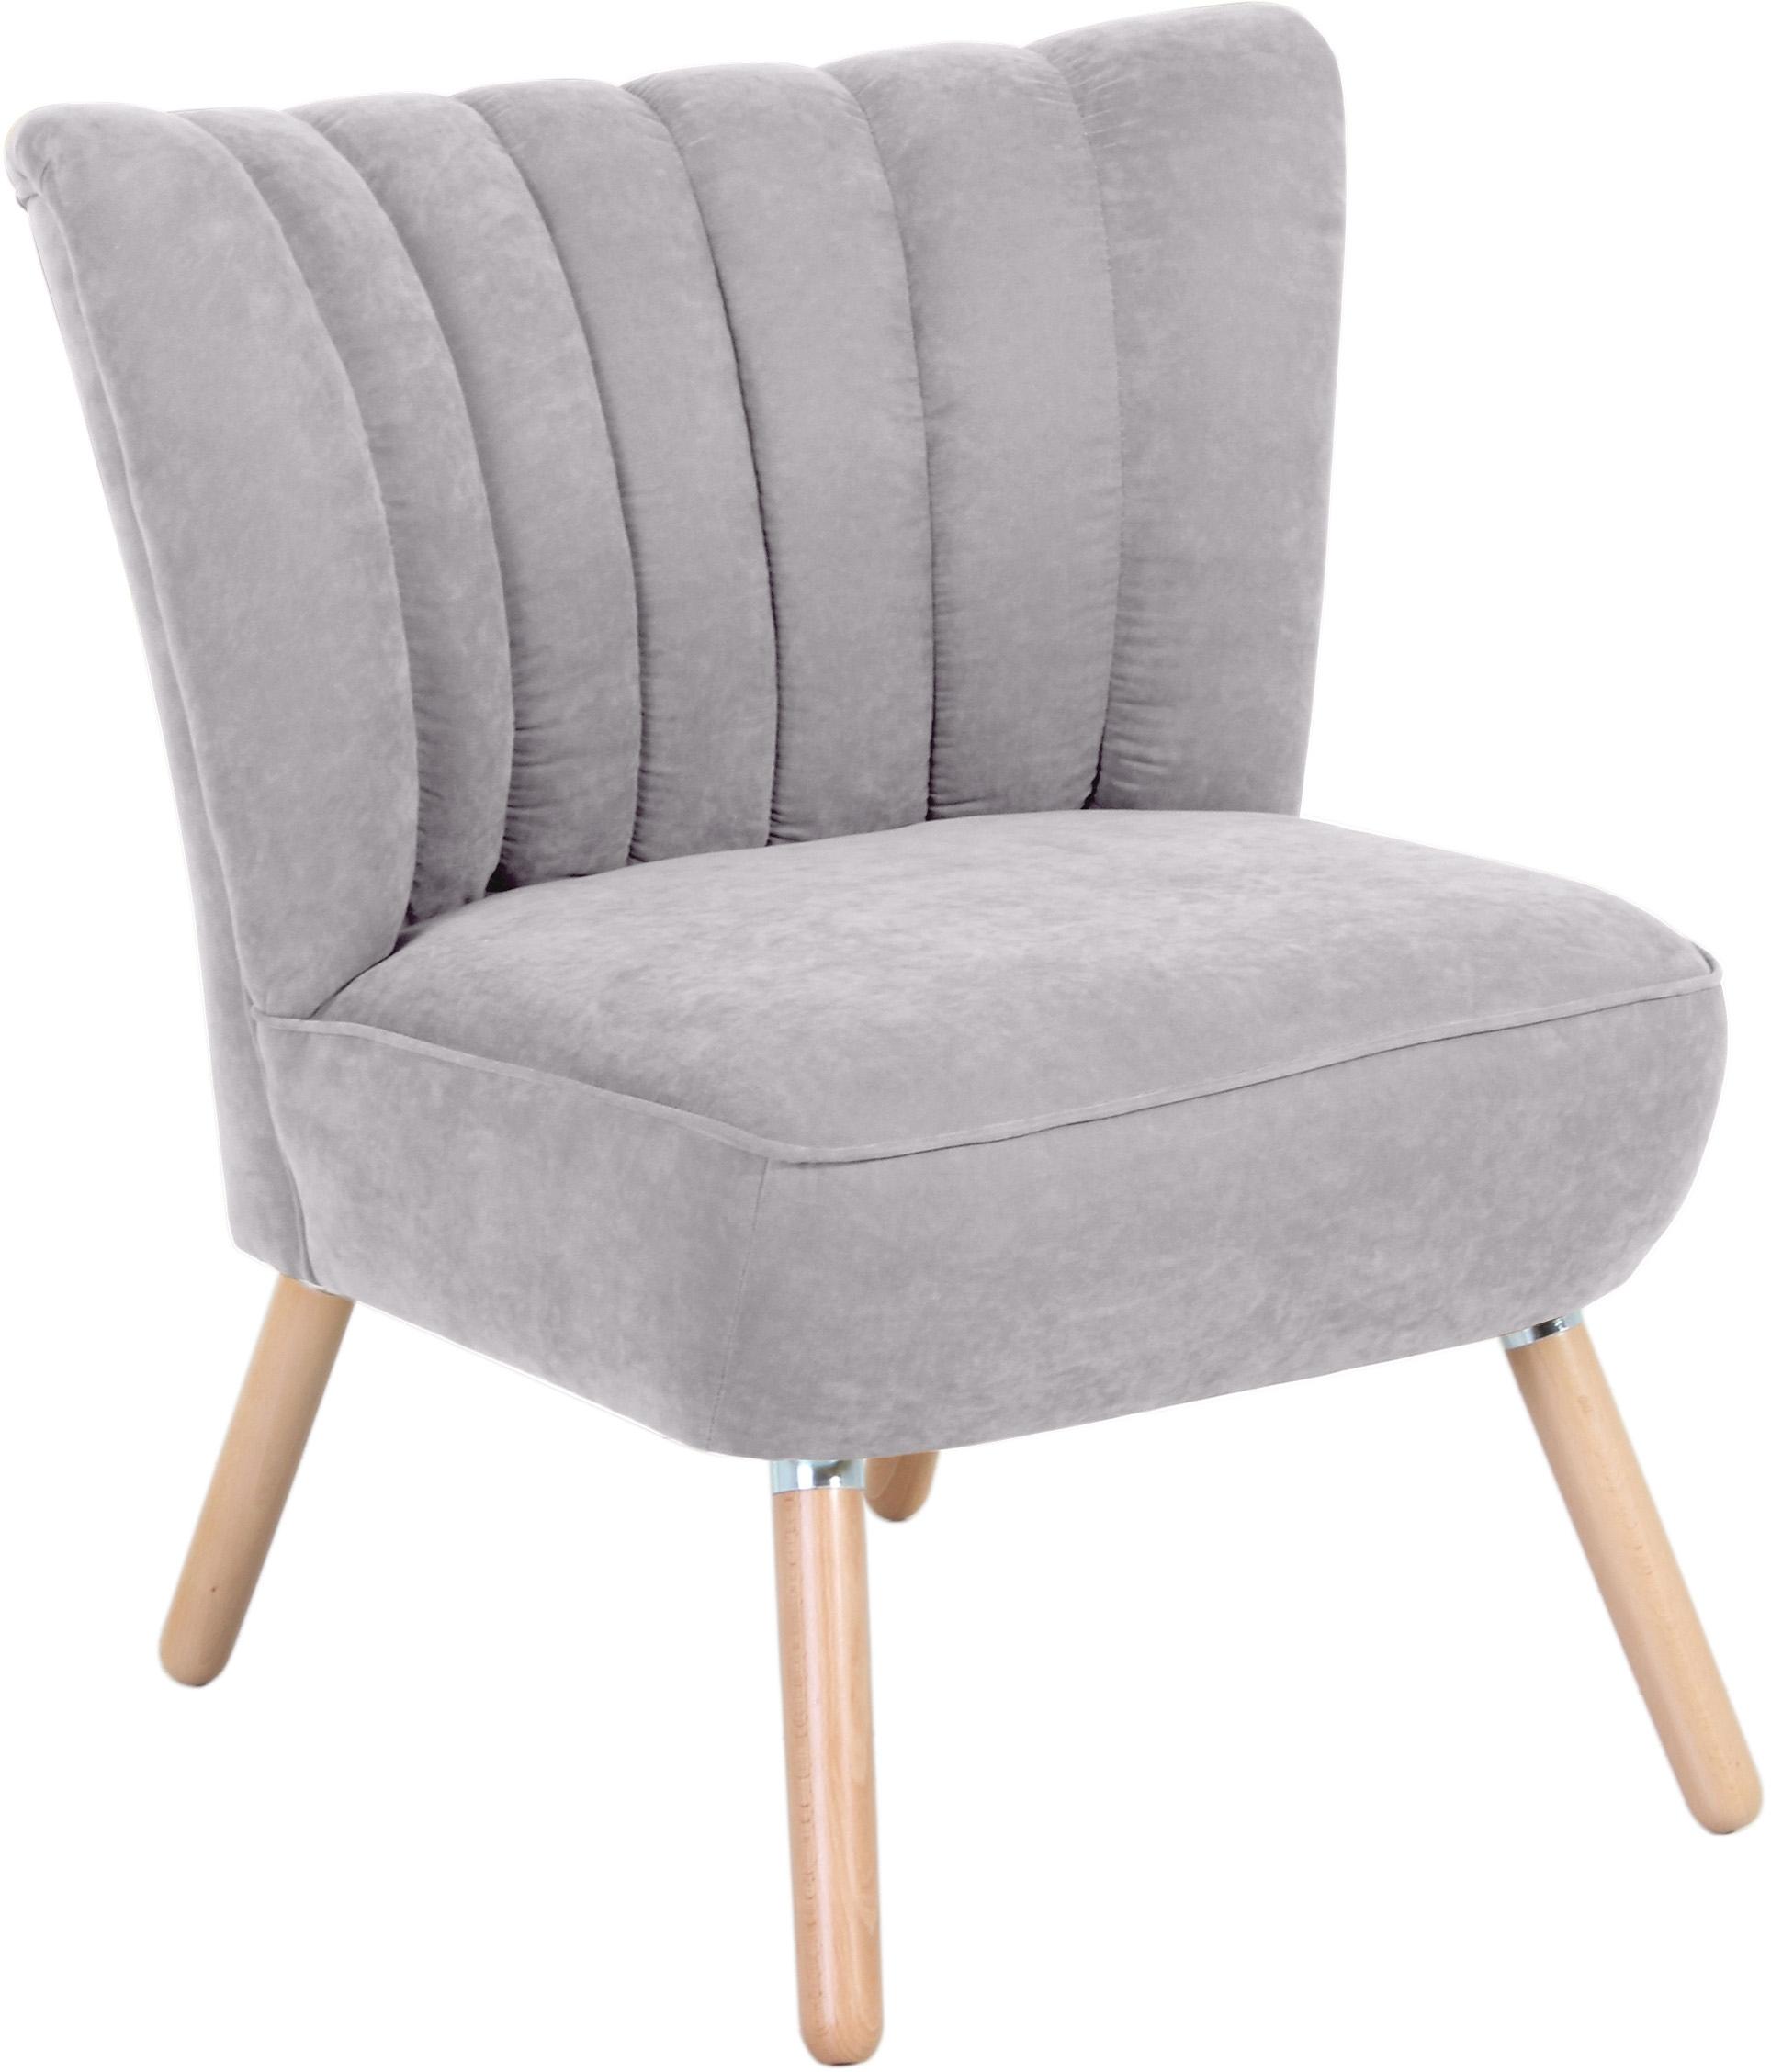 Max Winzer ® fauteuil in retrostijl »Aspen« online kopen op otto.nl